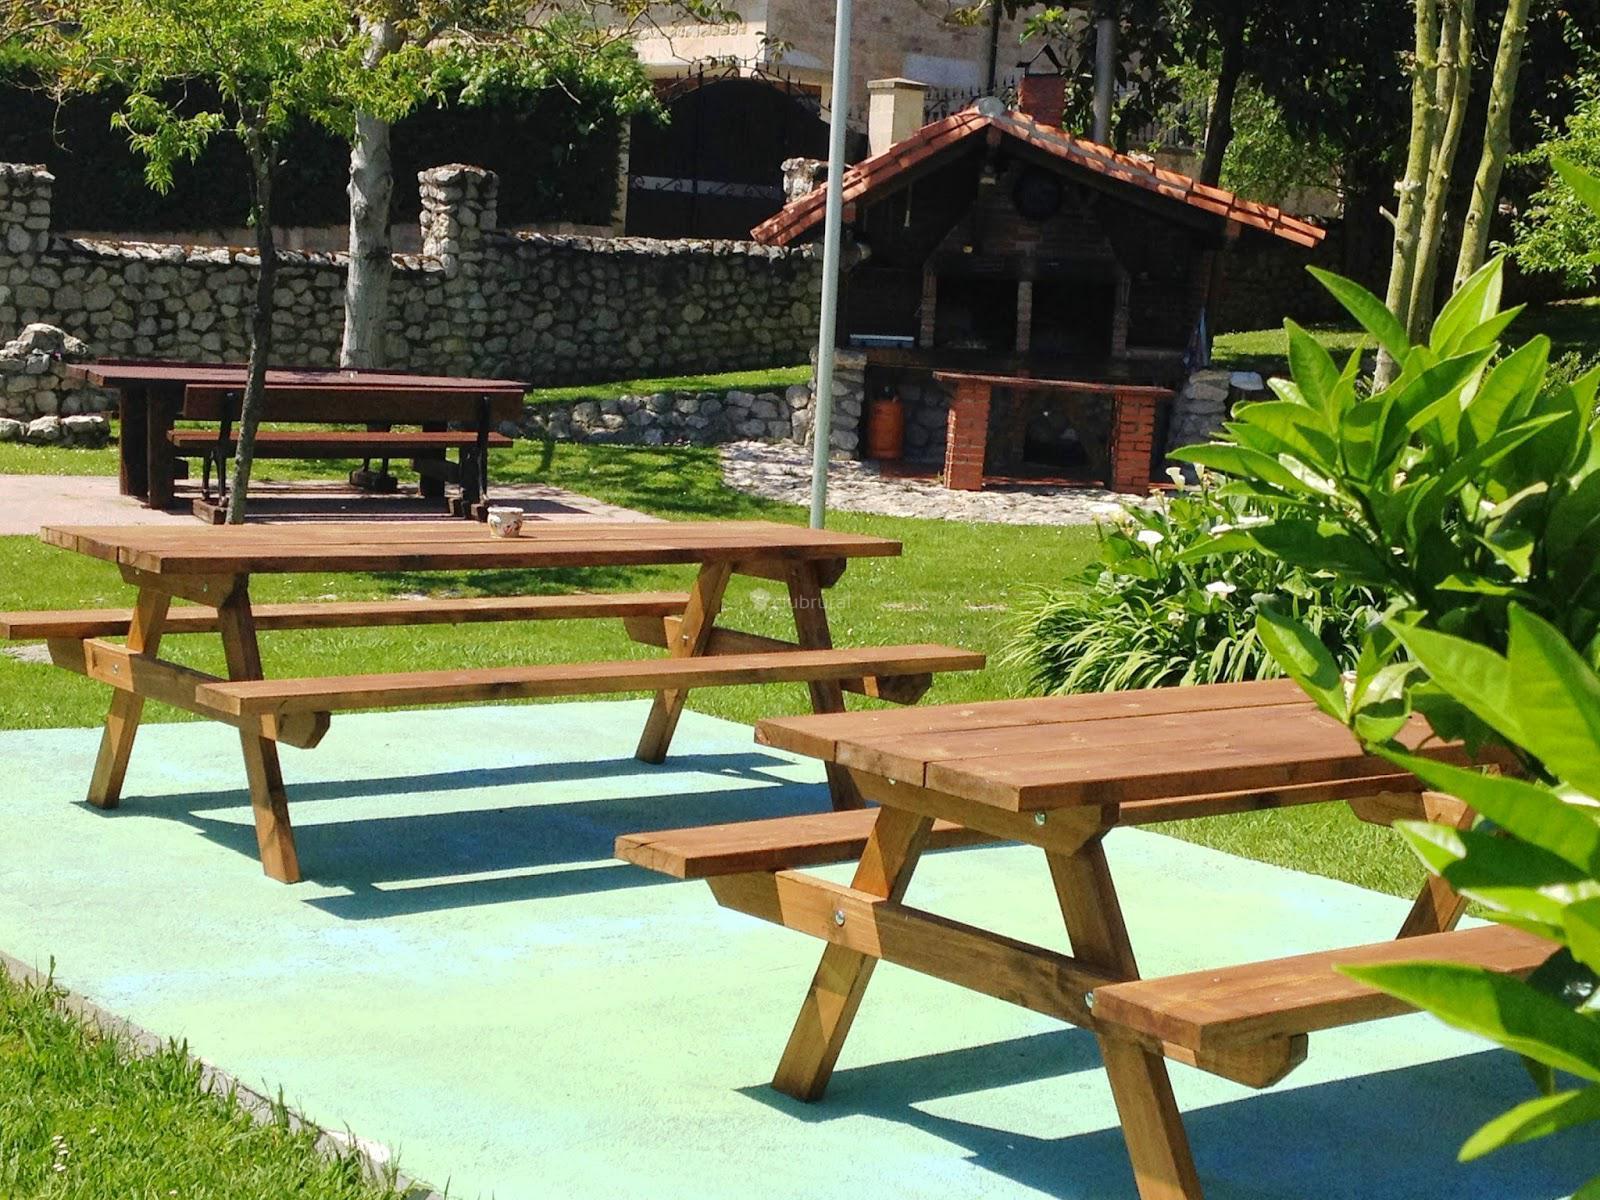 Fotos de avemar cantabria santillana del mar clubrural for Casa jardin cantabria